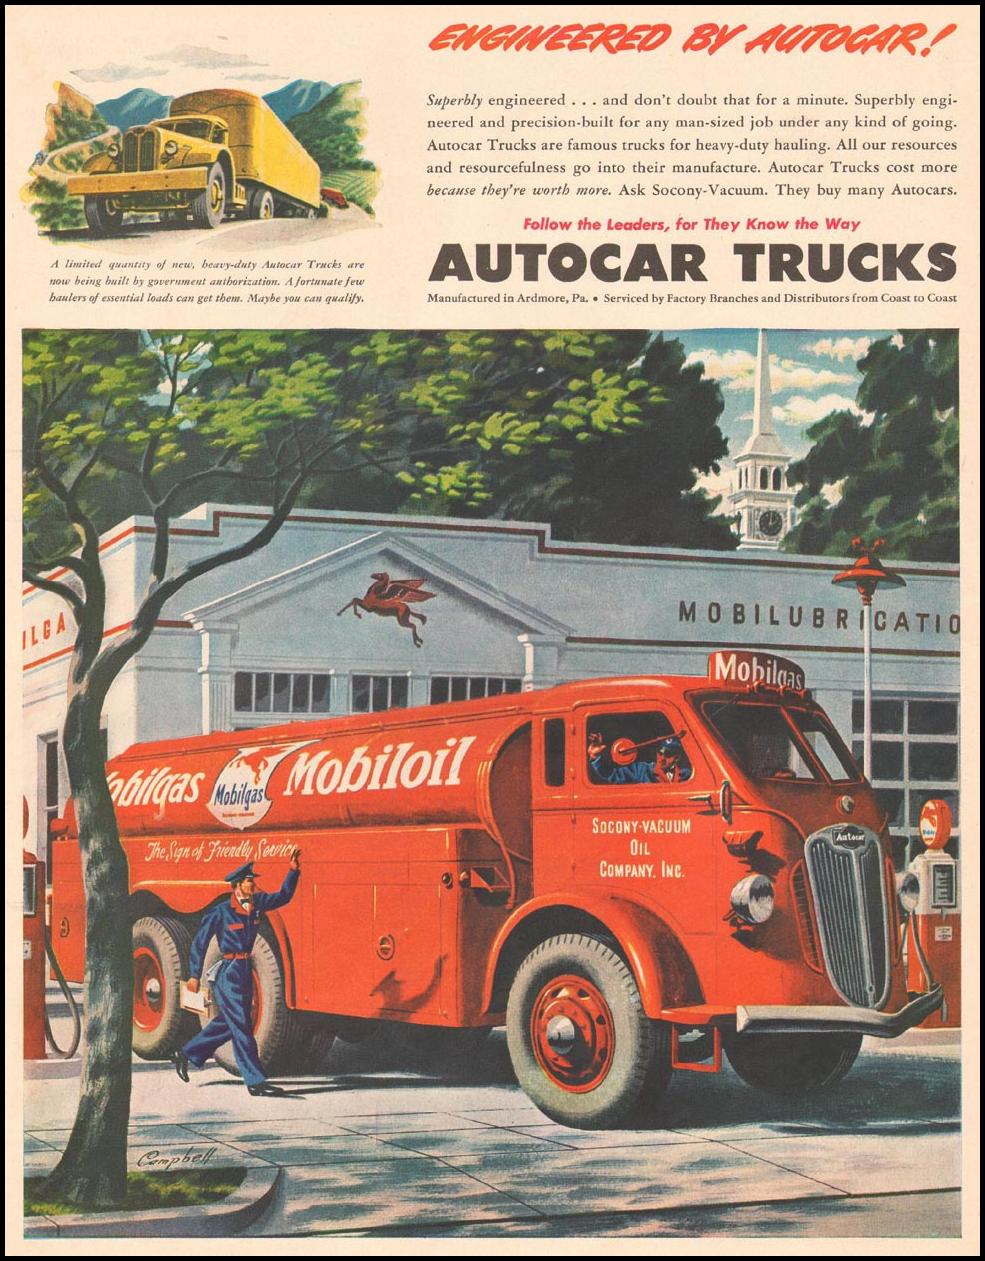 AUTOCAR TRUCKS LIFE 06/04/1941